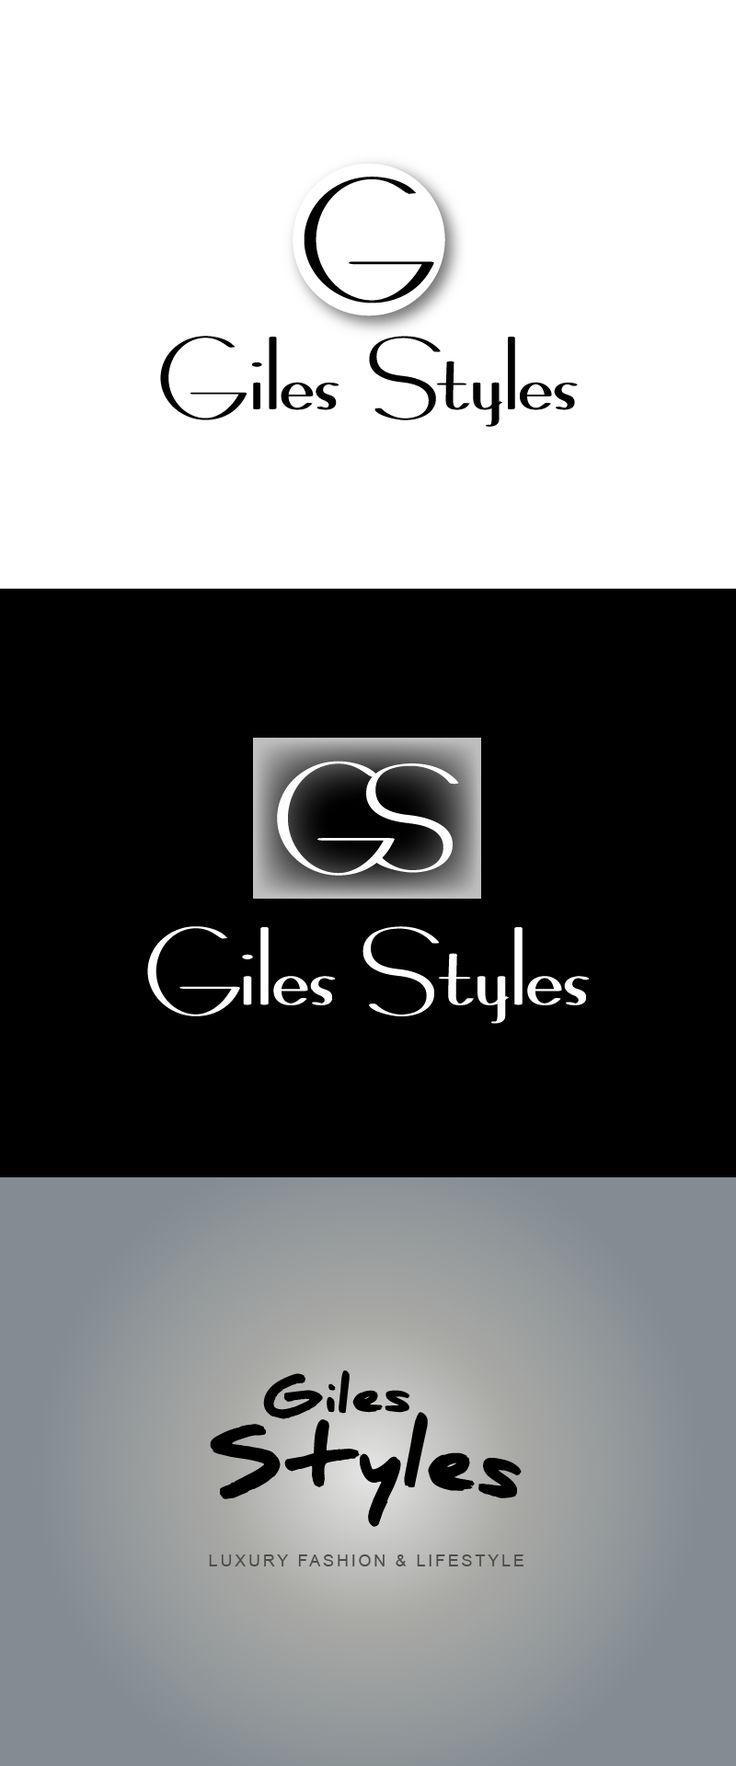 Logo Idea for Giles Styles  #logo #logotype #branding #stationary #graphic #design #illlustrator